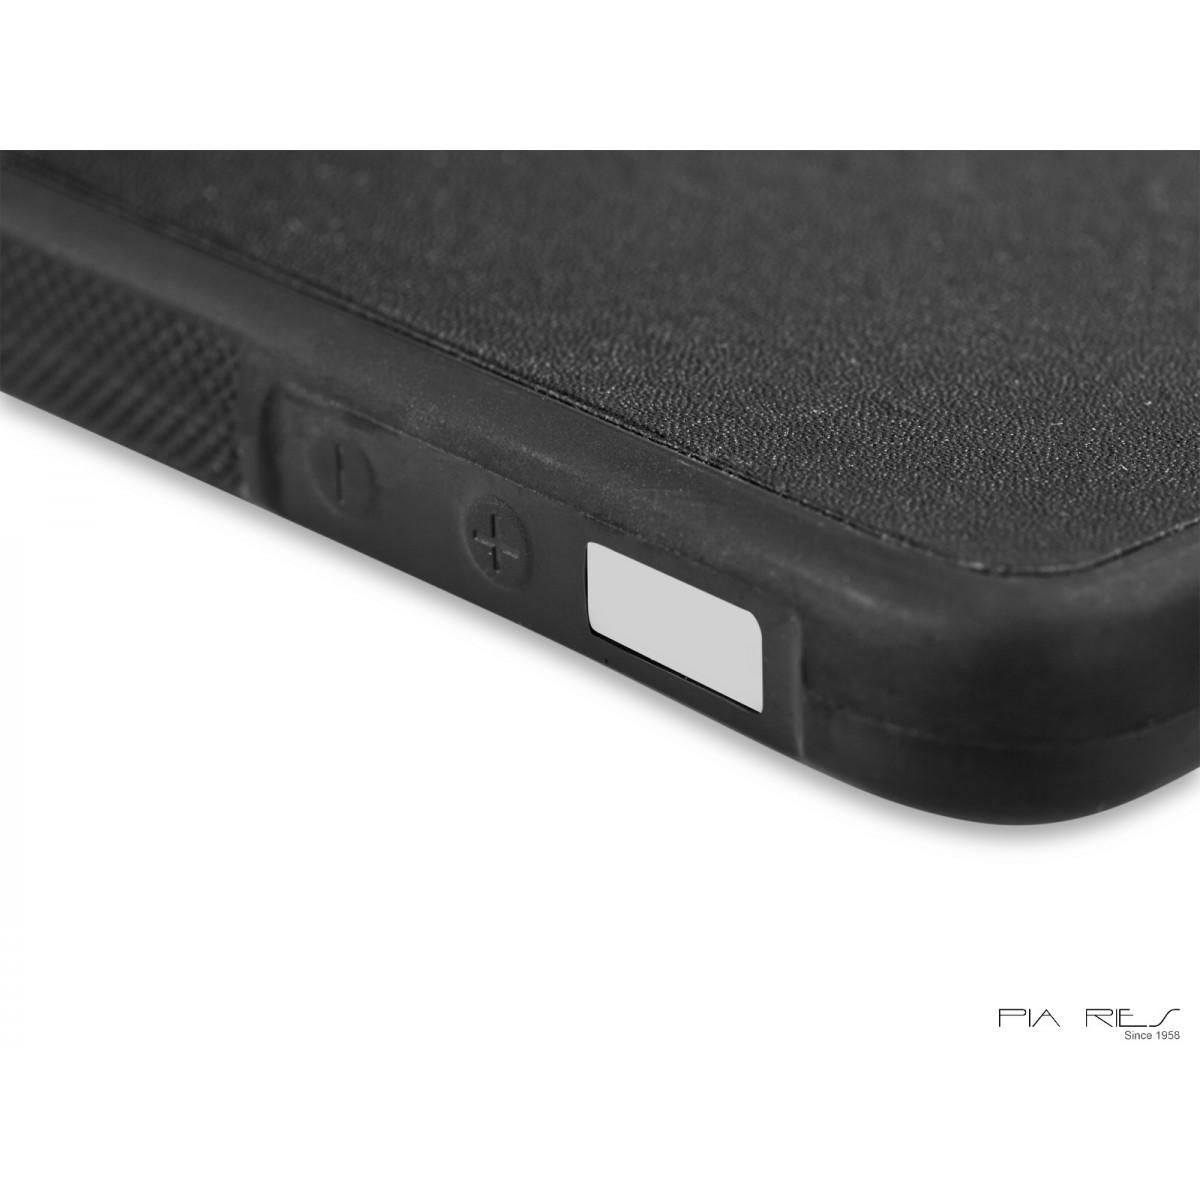 iPhone55Splastikcover-34